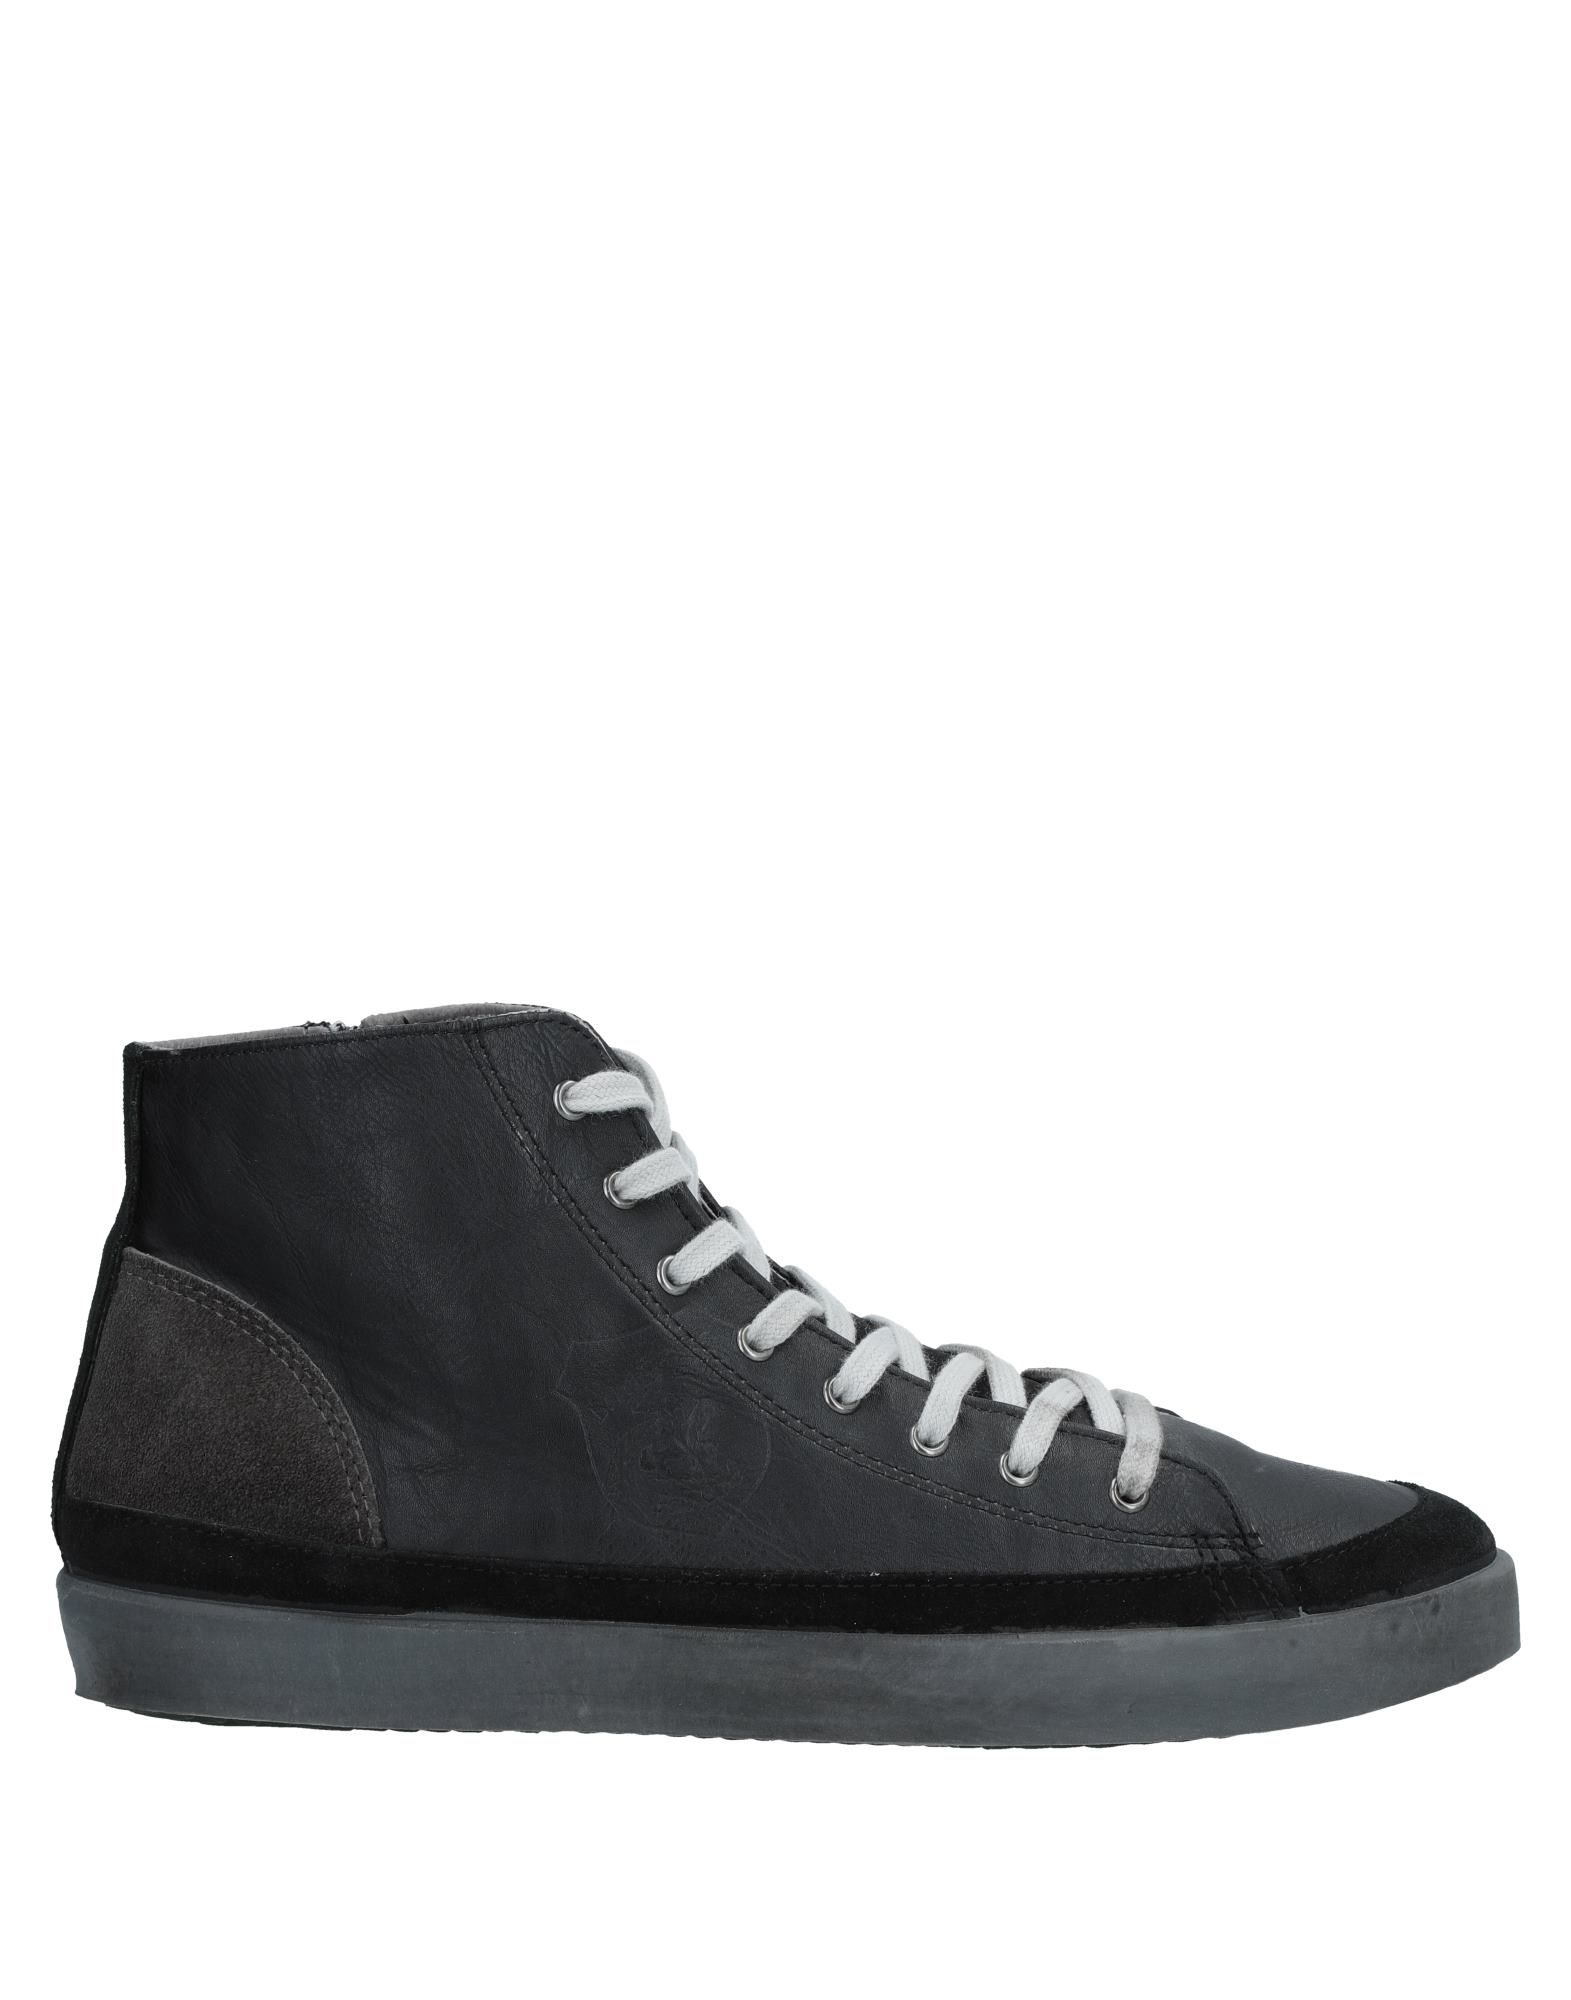 Beverly Hills Polo Club Sneakers Herren  11535800TT Heiße Schuhe